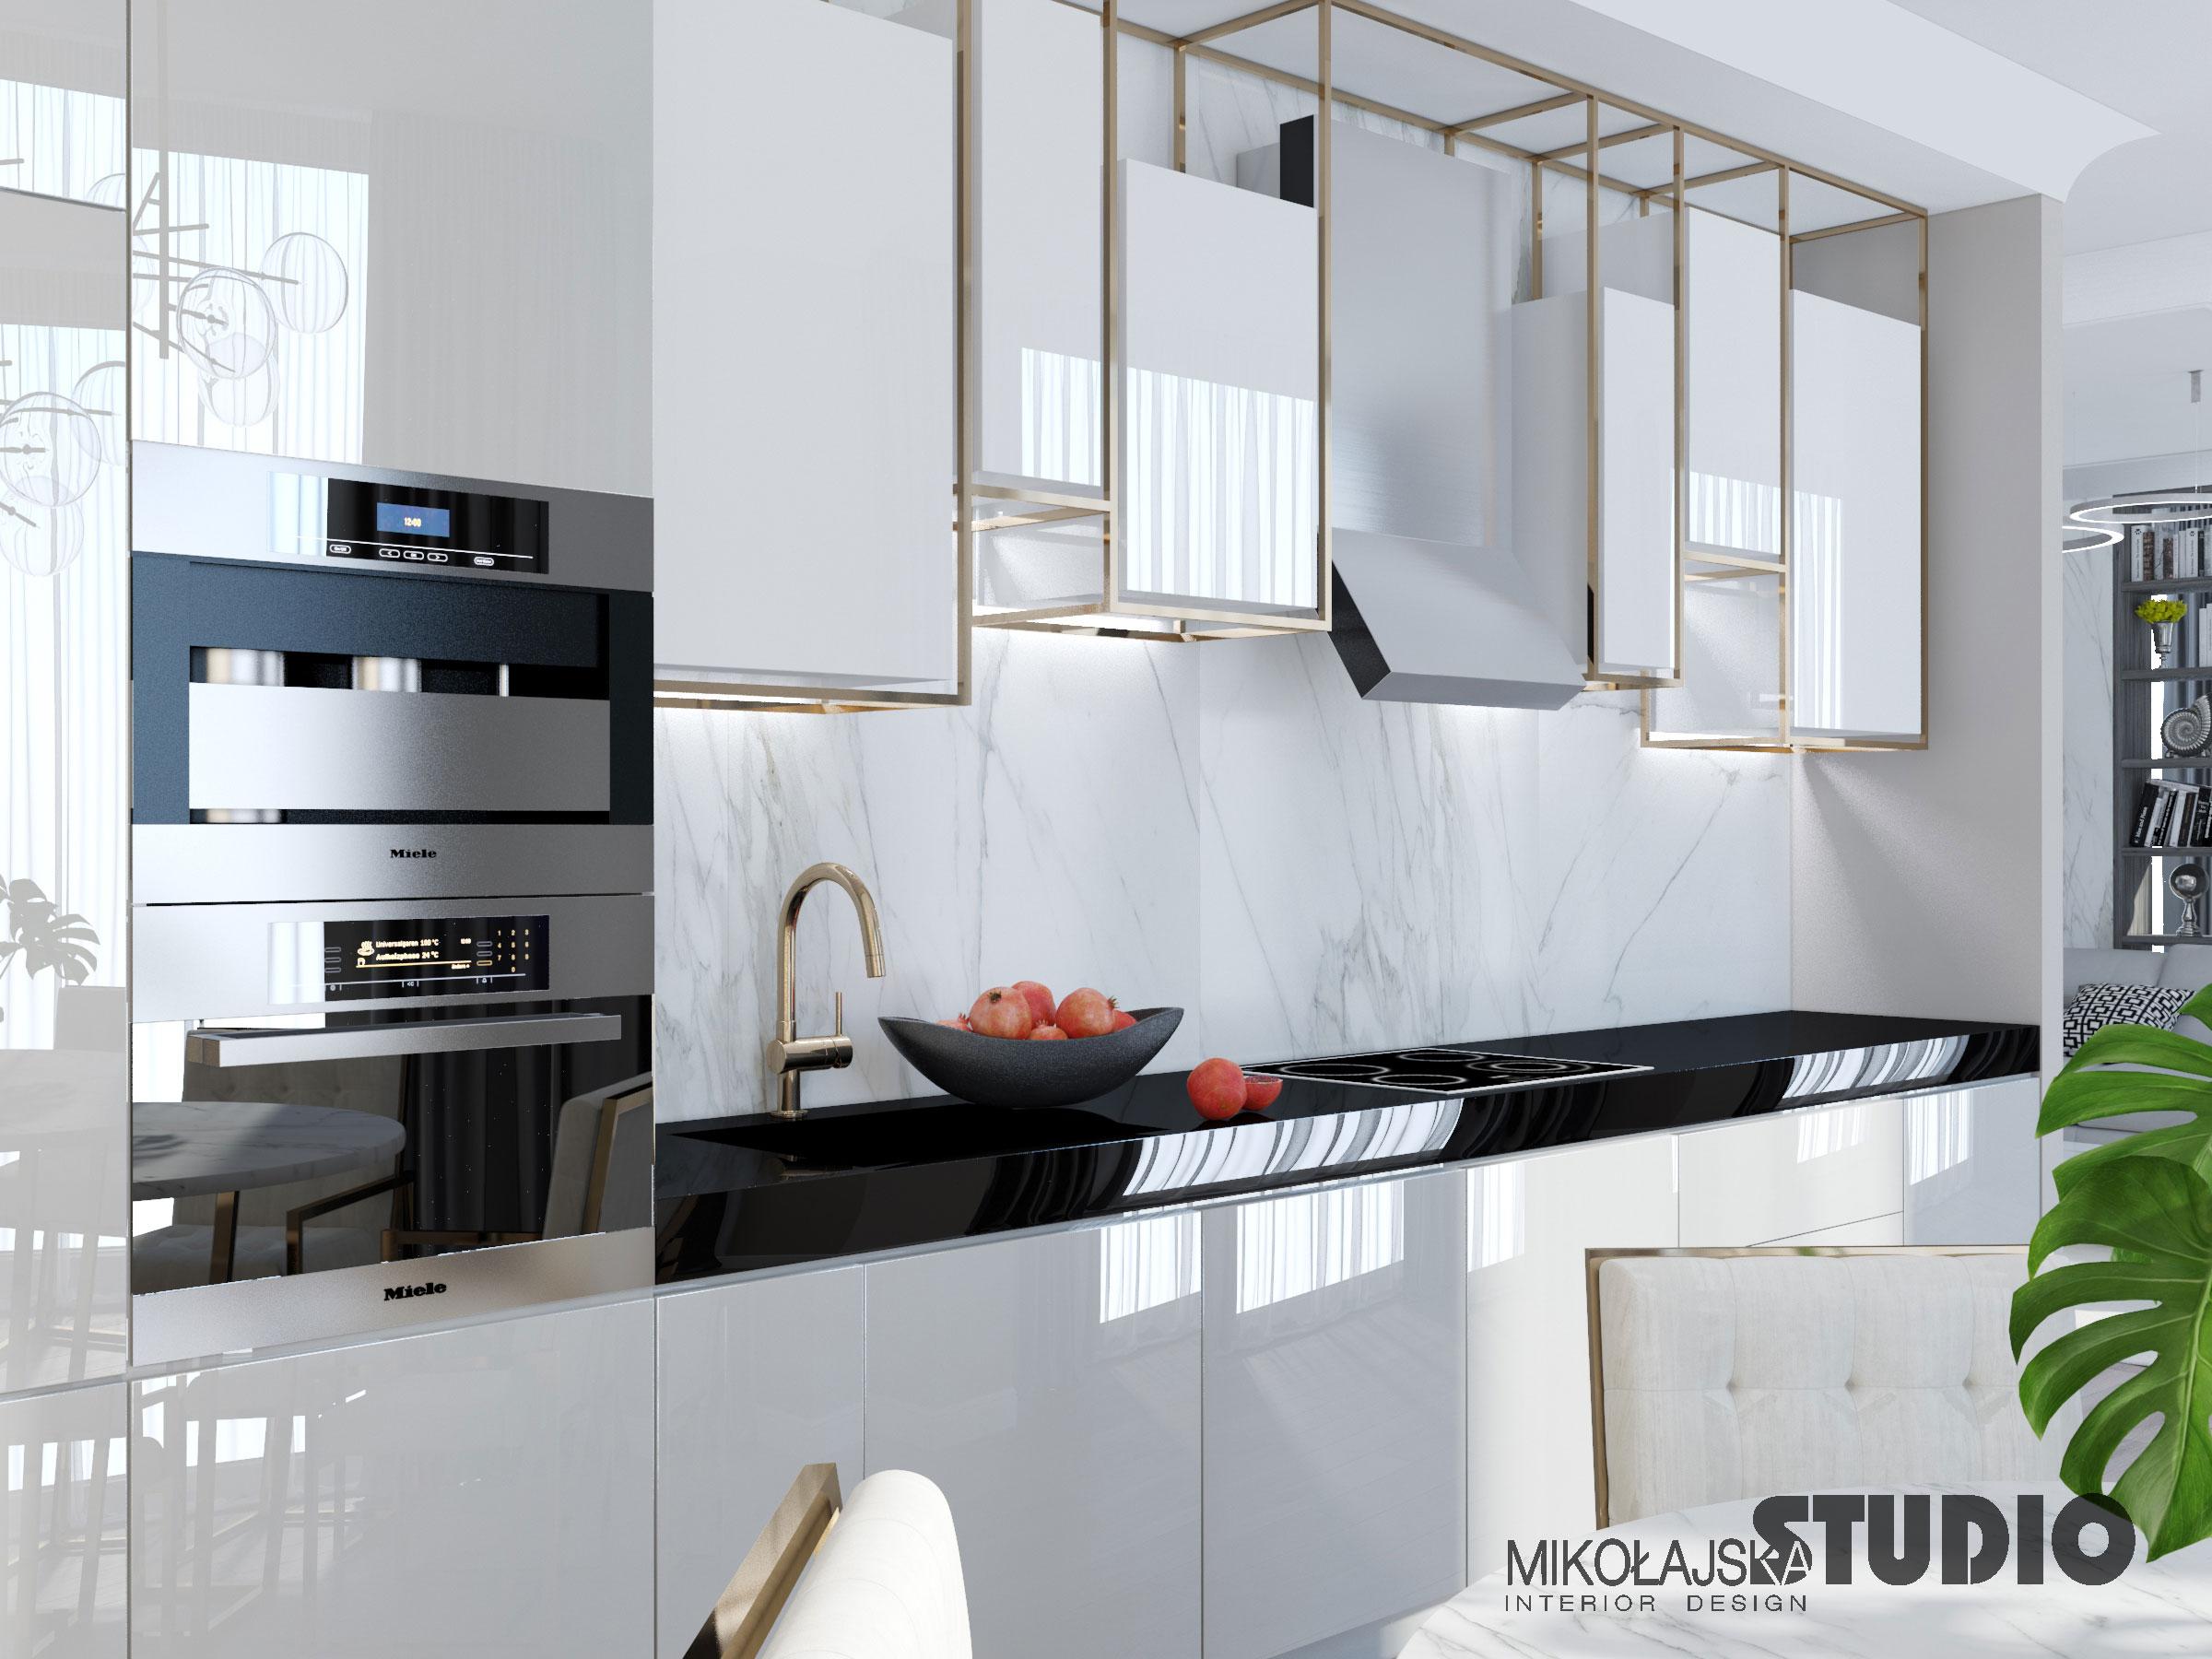 Złota armatura w kuchni | Projekt pracowni Mikołajska Studio